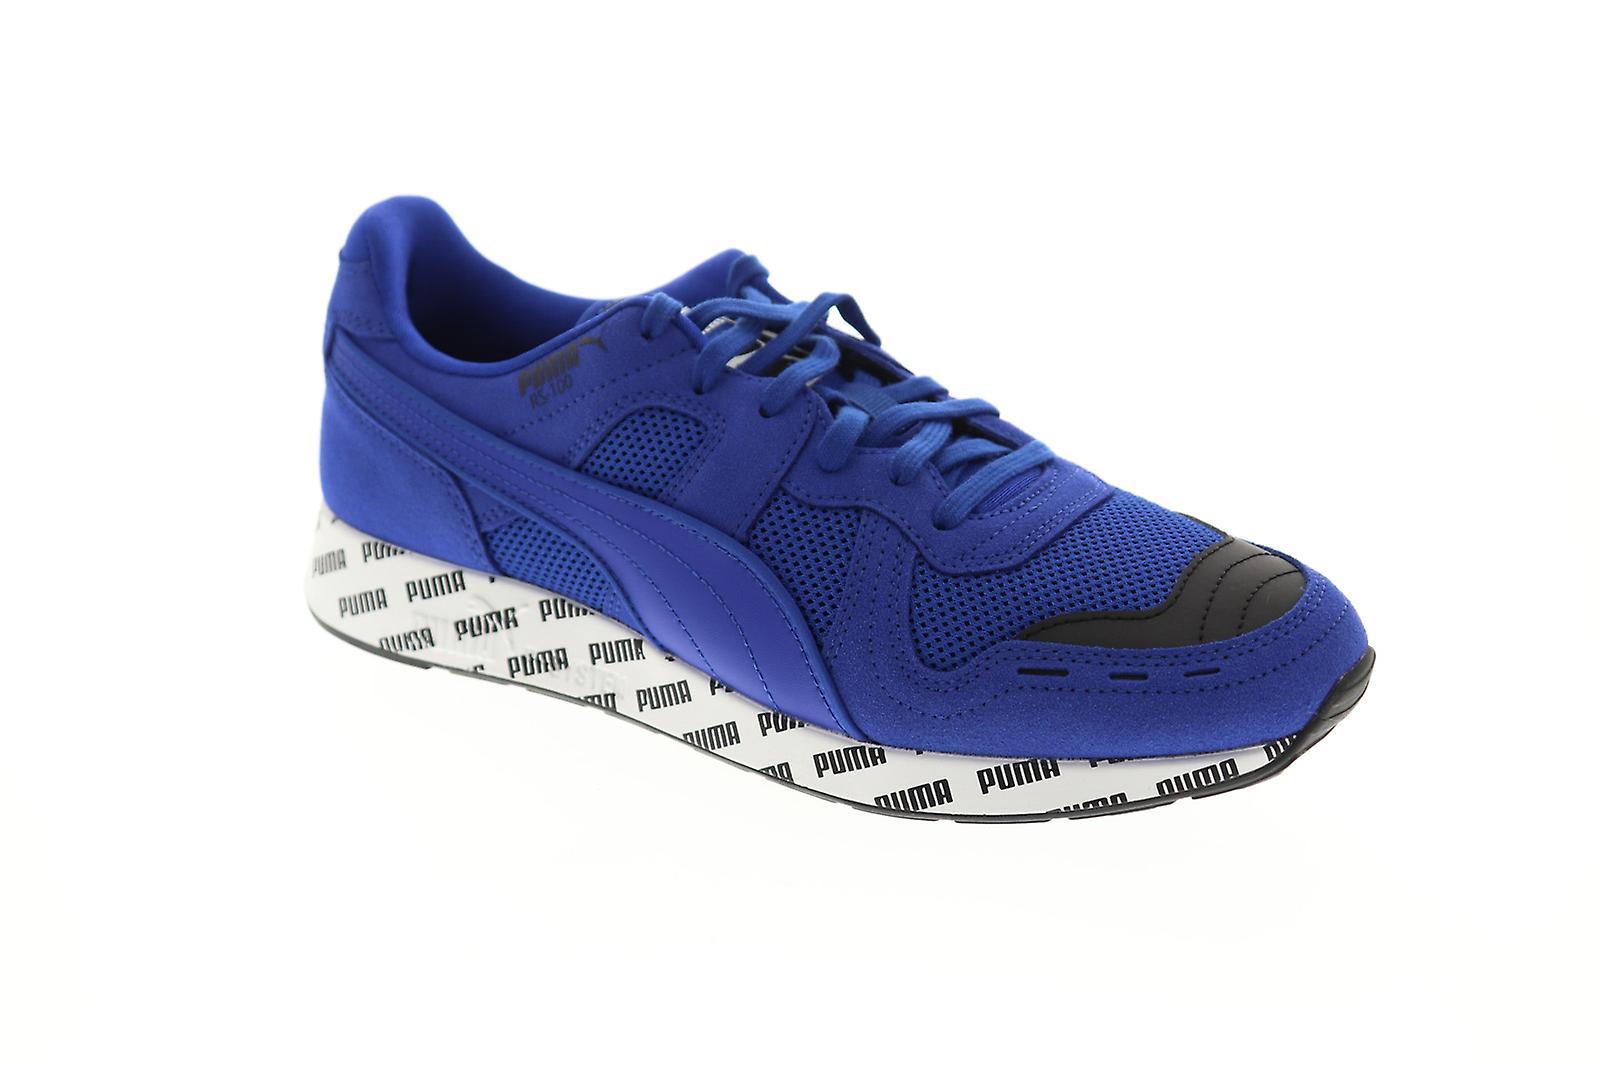 Puma RS-100 sommar mens blå mesh casual spetsar upp låg Top sneaker...